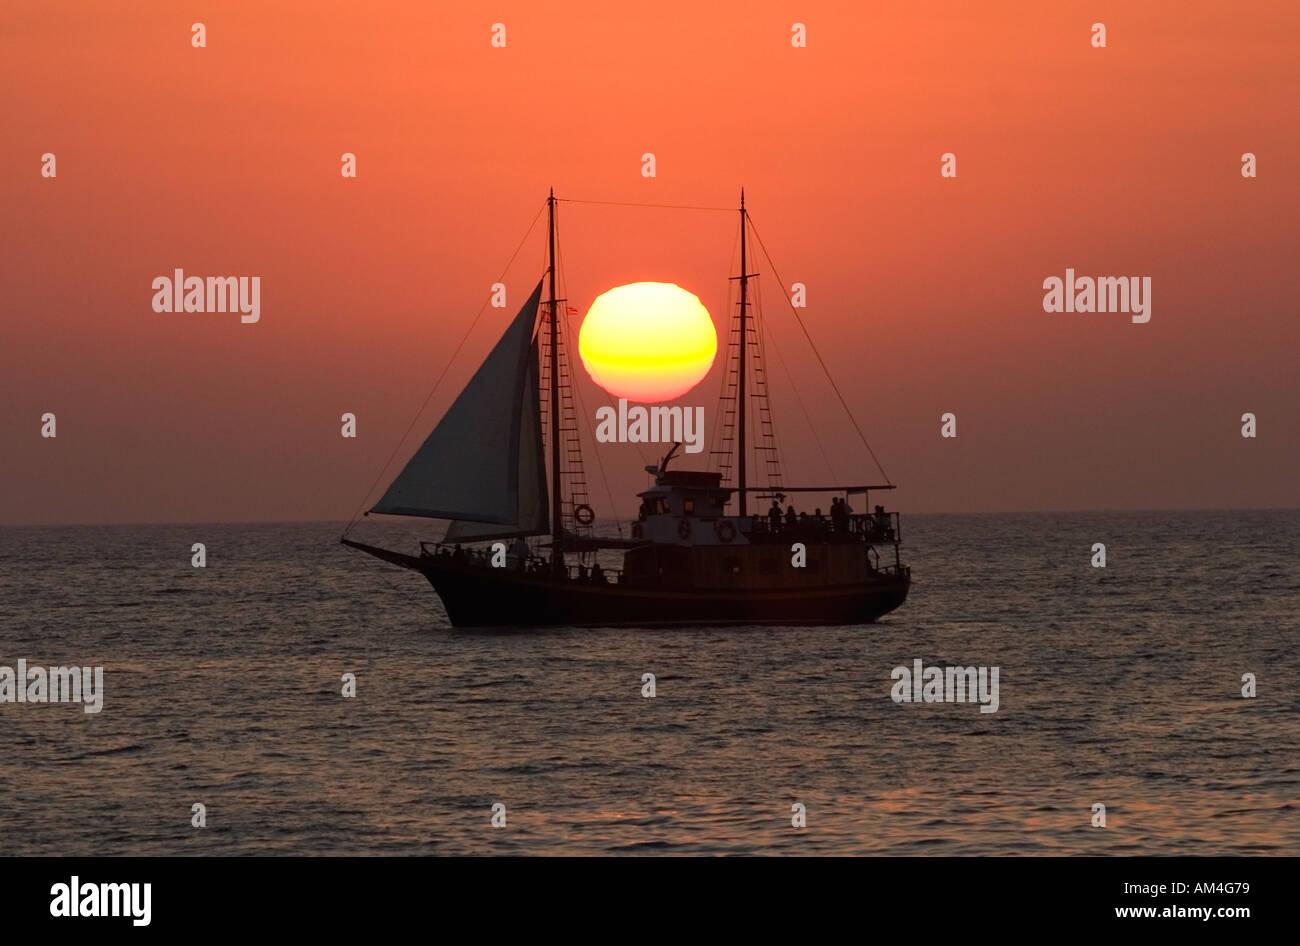 Santorini sunset - Stock Image